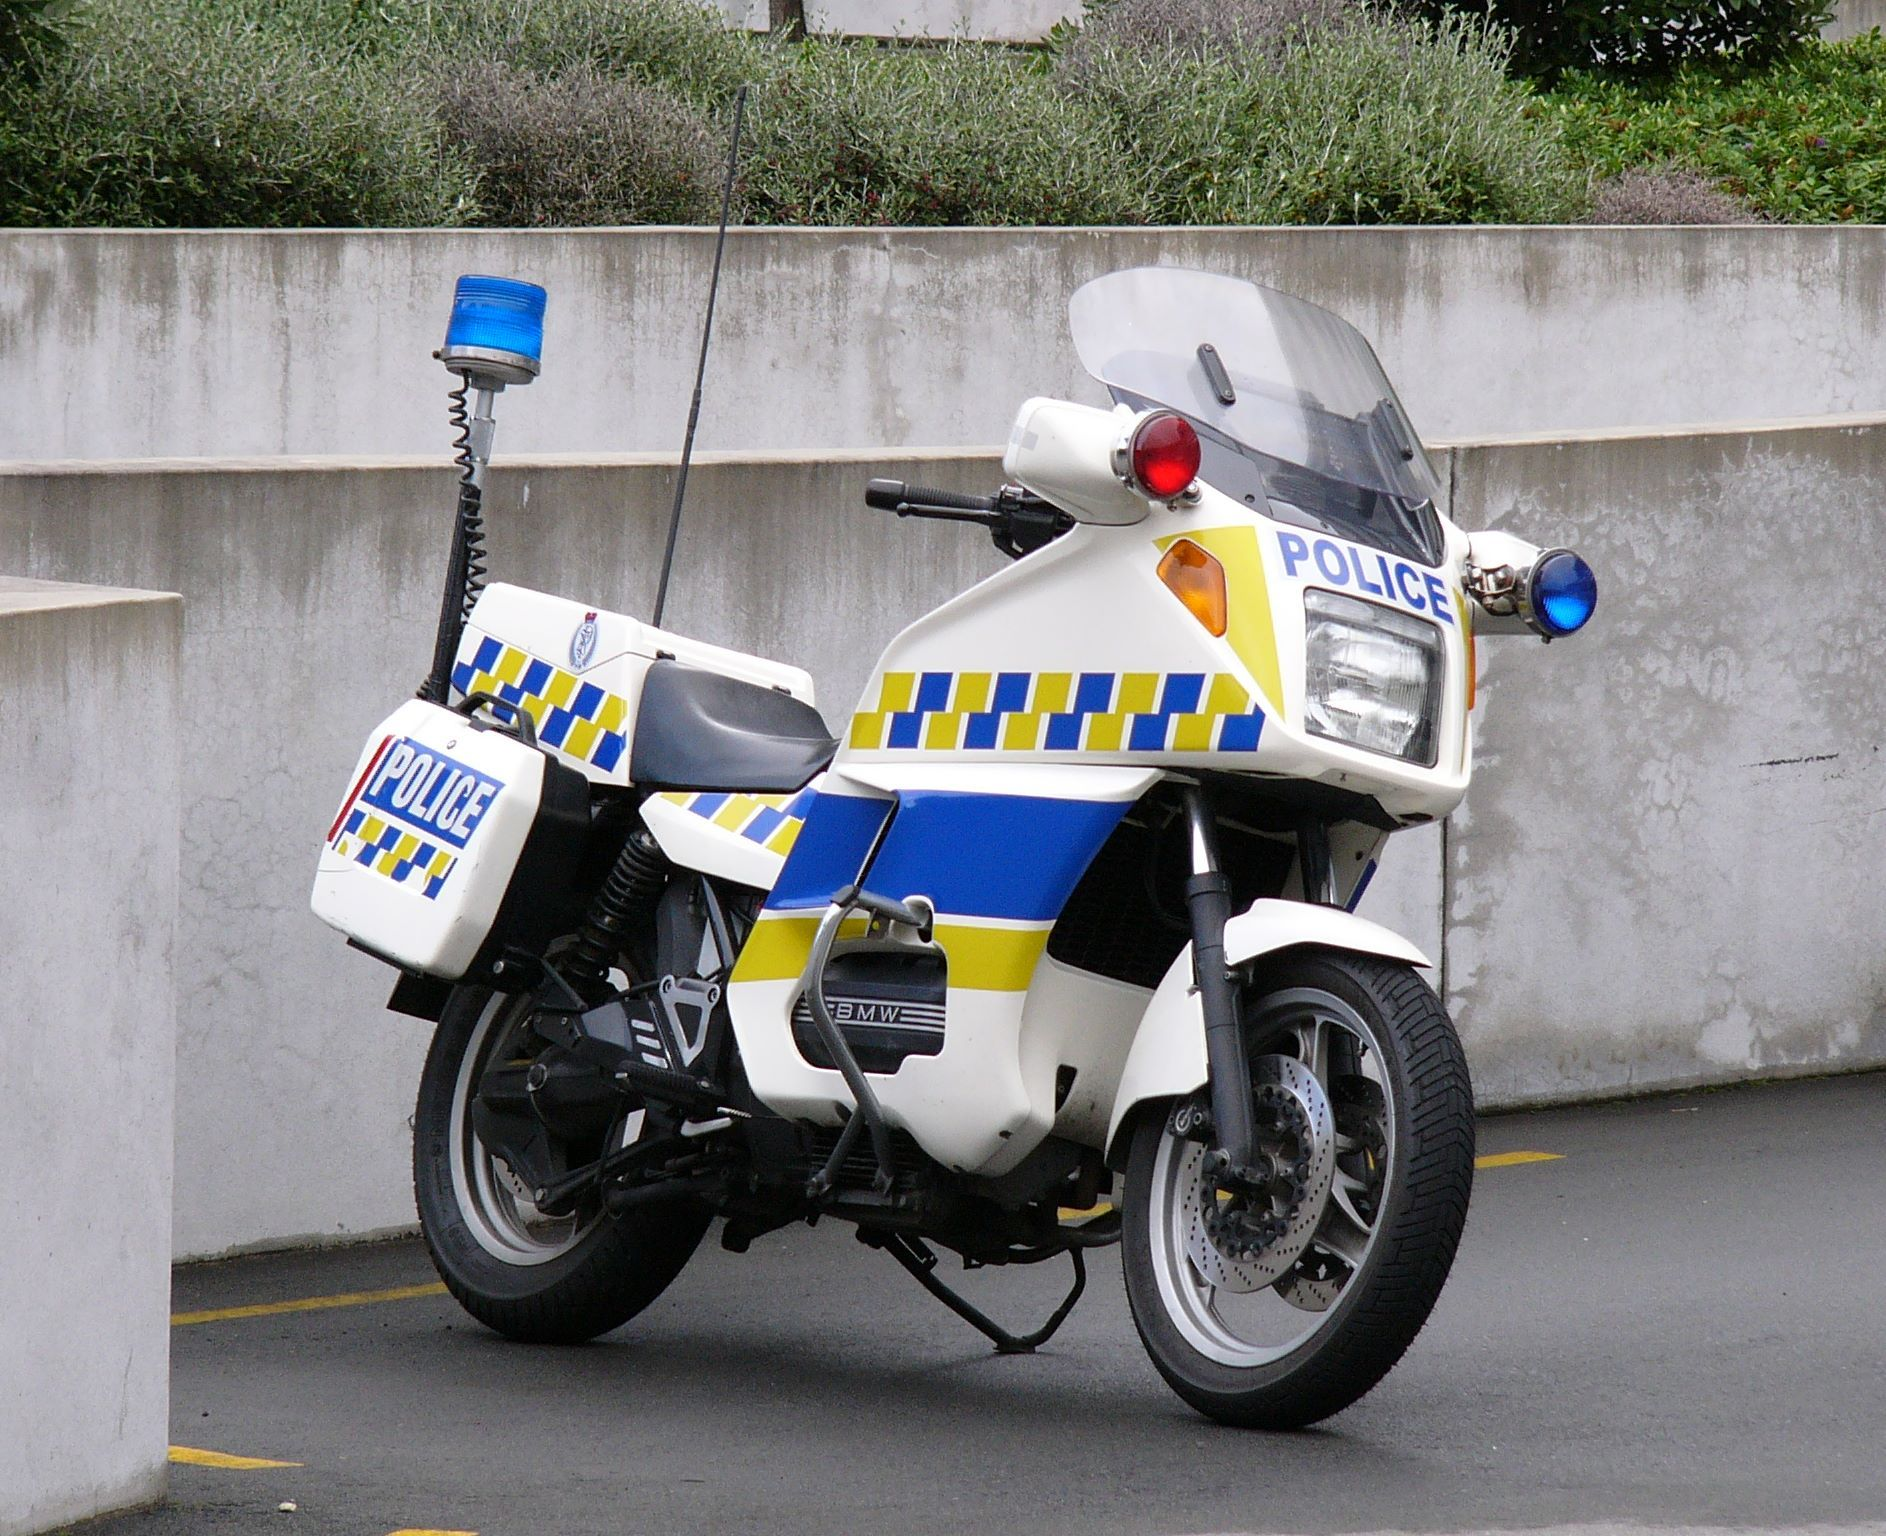 new zealand police motorcycle police motorcycle bmw setcom http  [ 1886 x 1536 Pixel ]